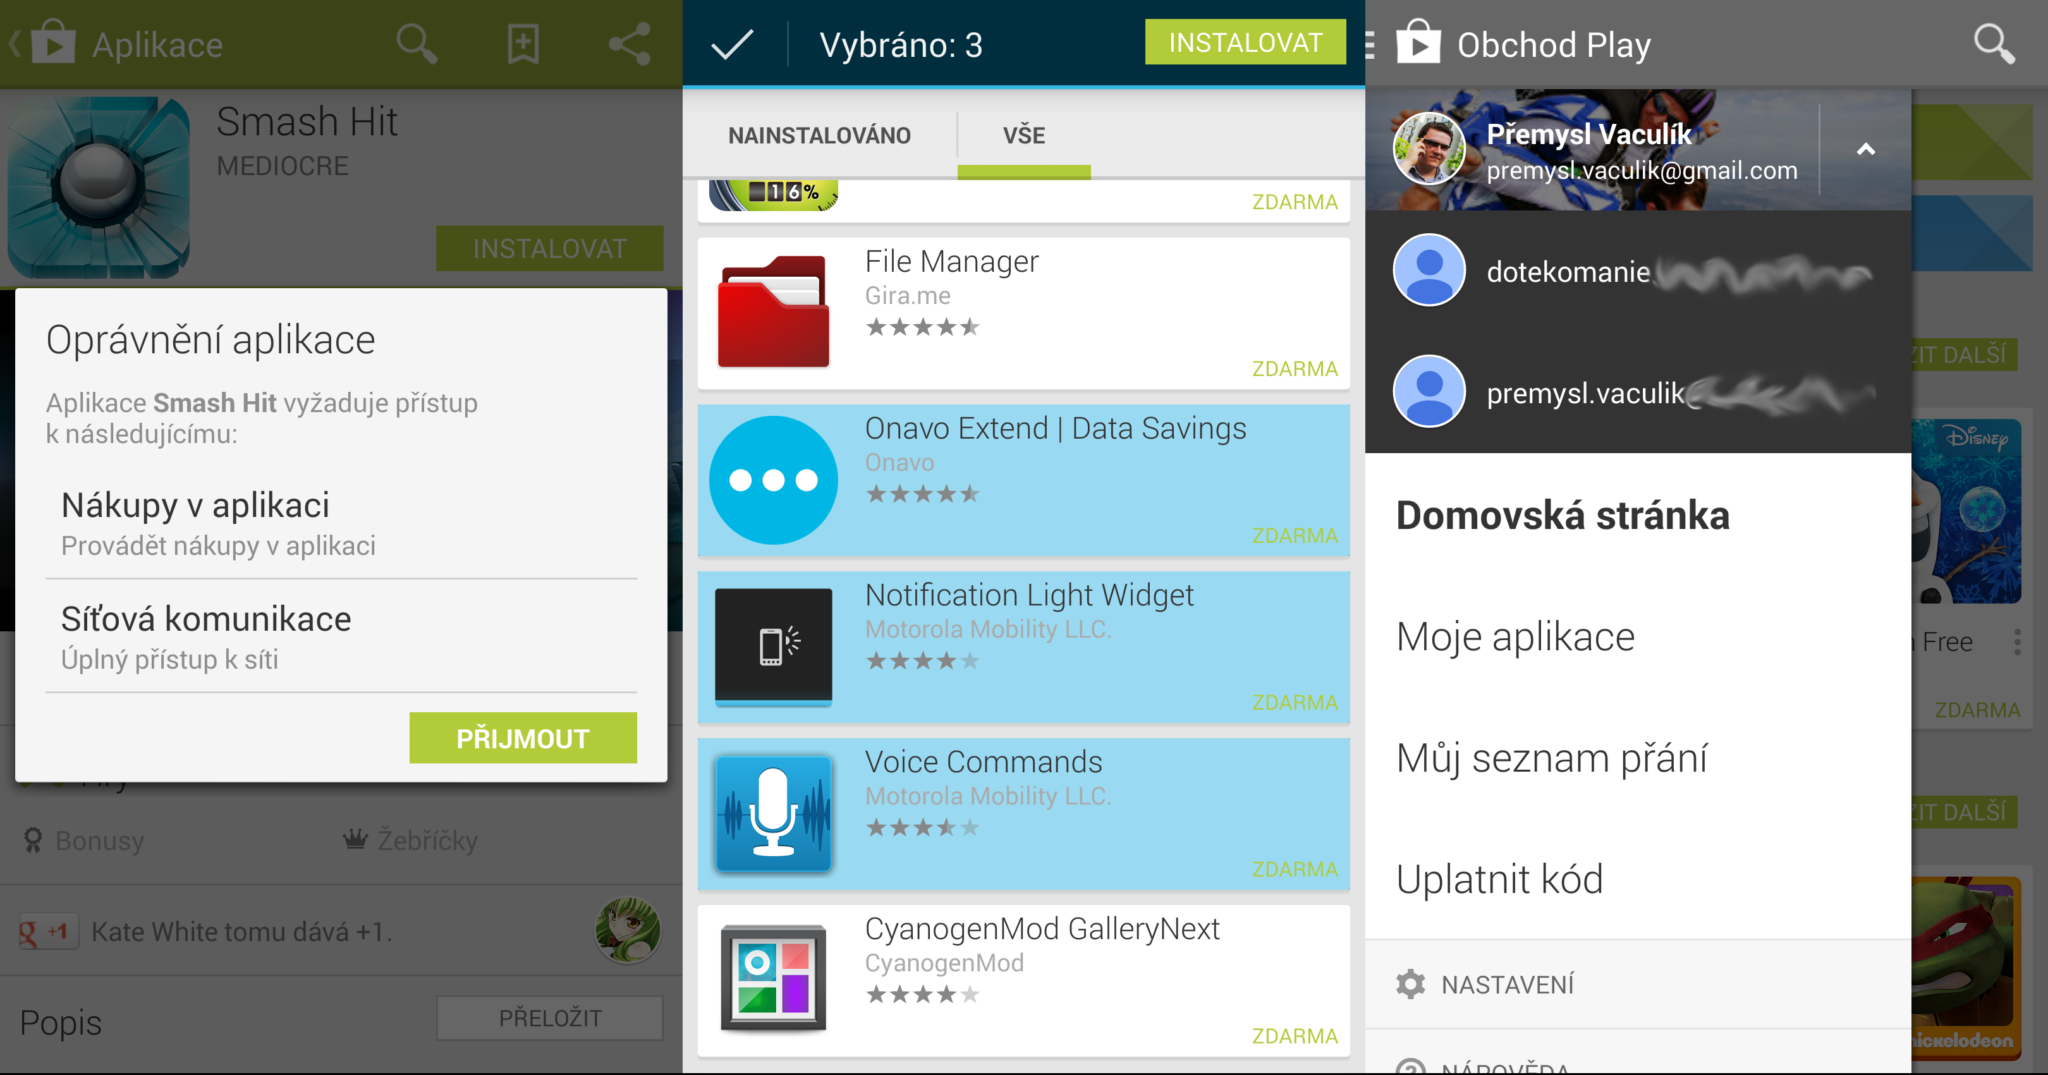 Novinky v Obchodu Play pro Android [apk]